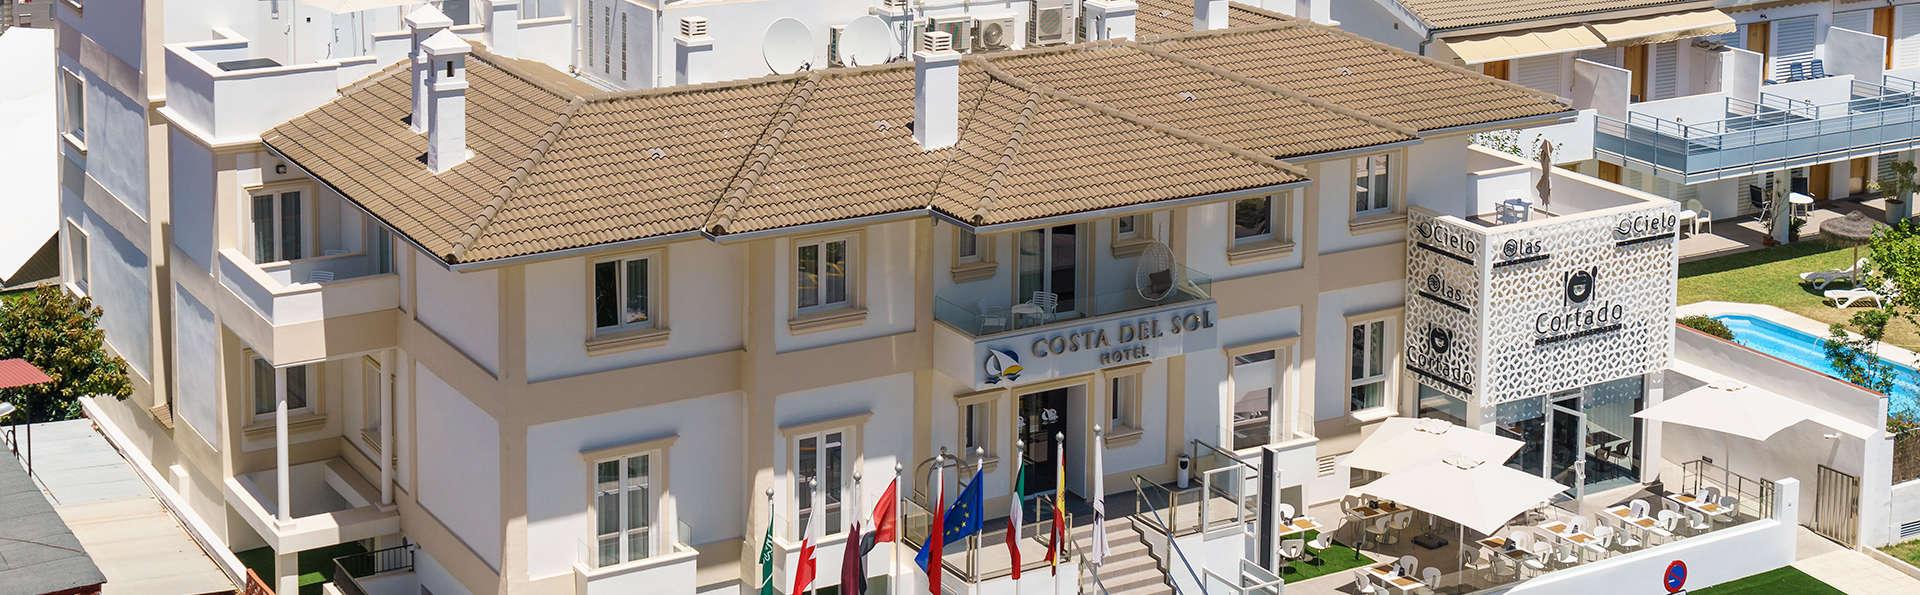 Costa del Sol Torremolinos Sustainable Boutique Hotel - EDIT_NEW_FRONT6.jpg